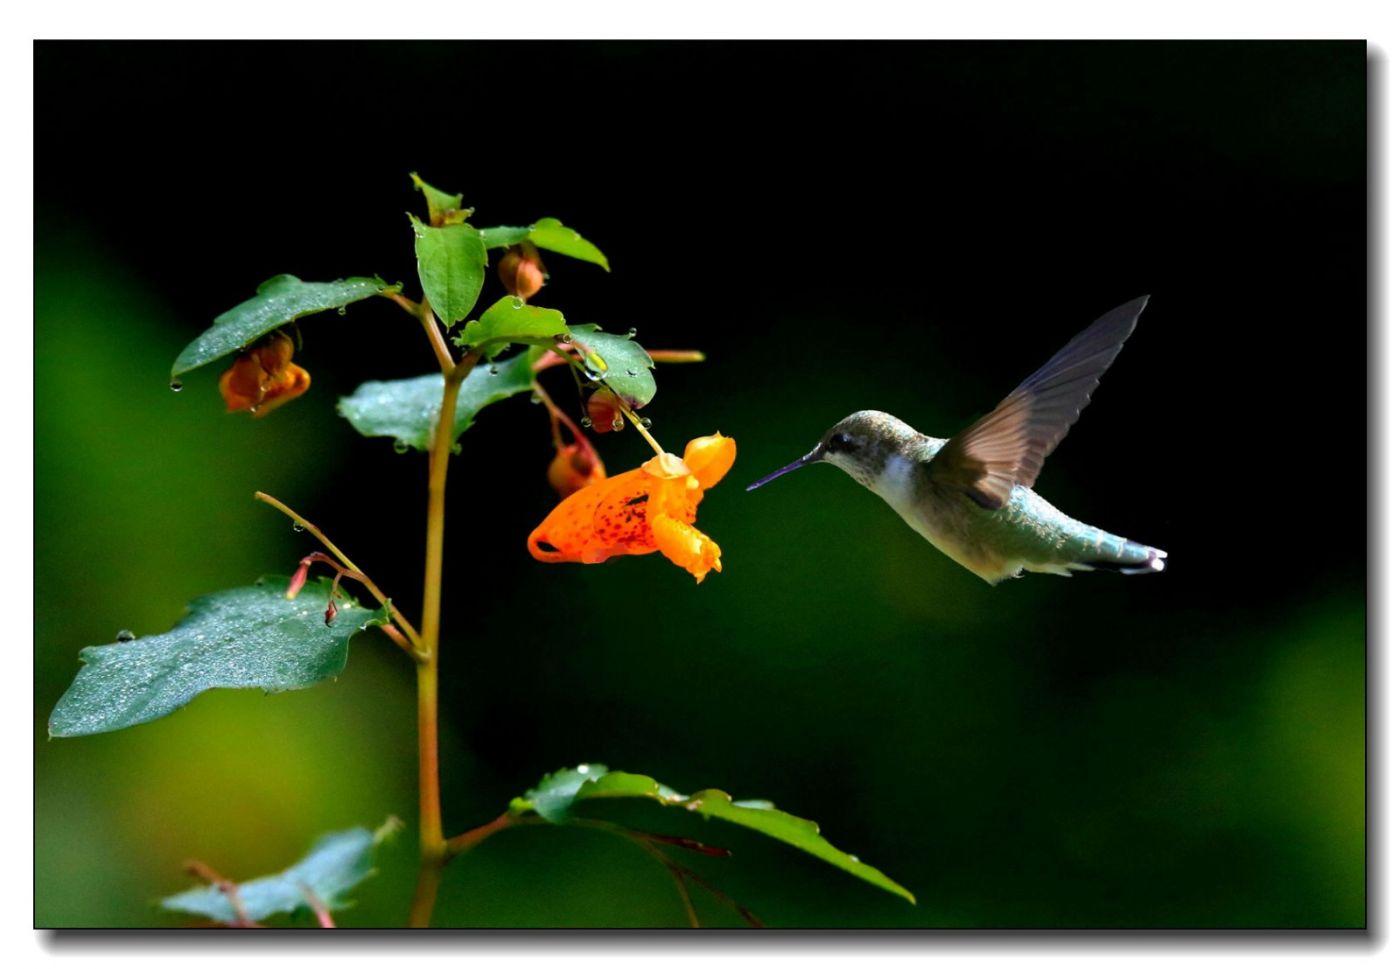 蜂鸟组图(七)_图1-1